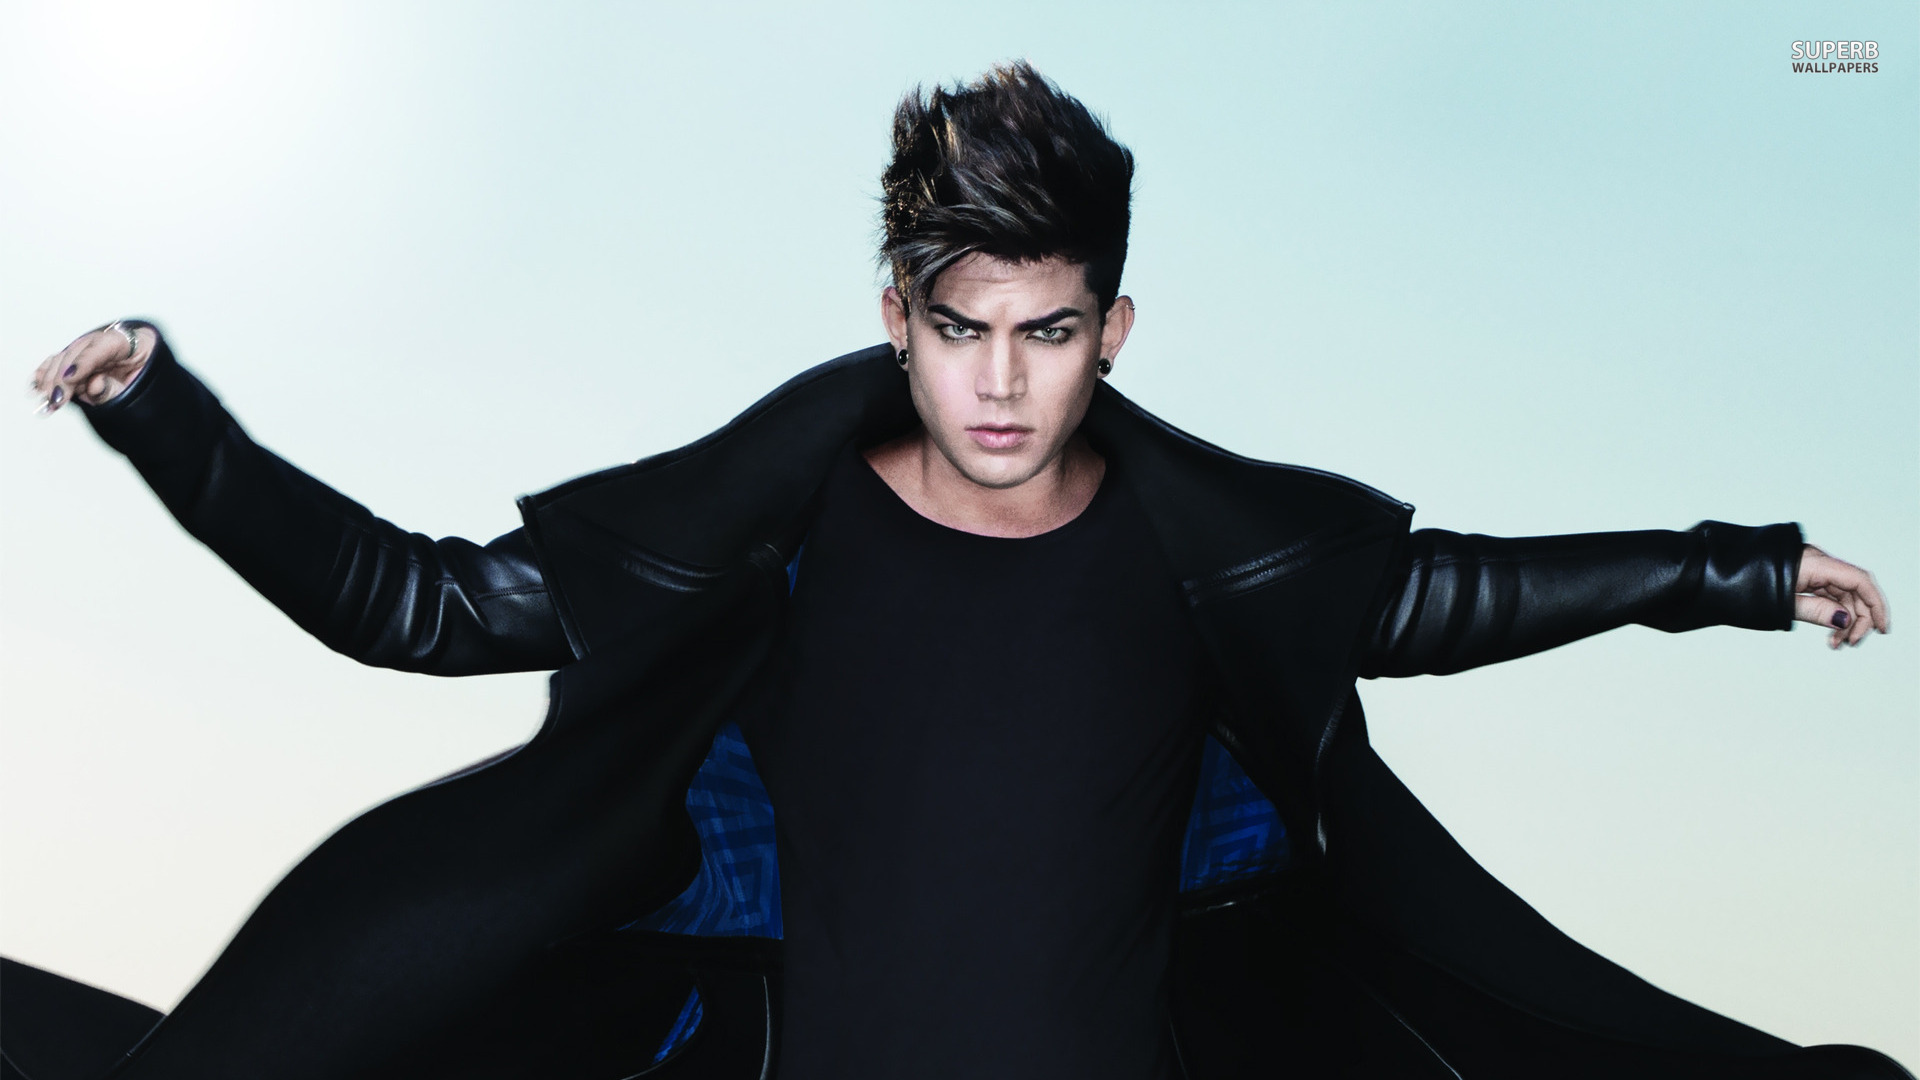 Adam Lambert Wallpapers High Quality | Download Free